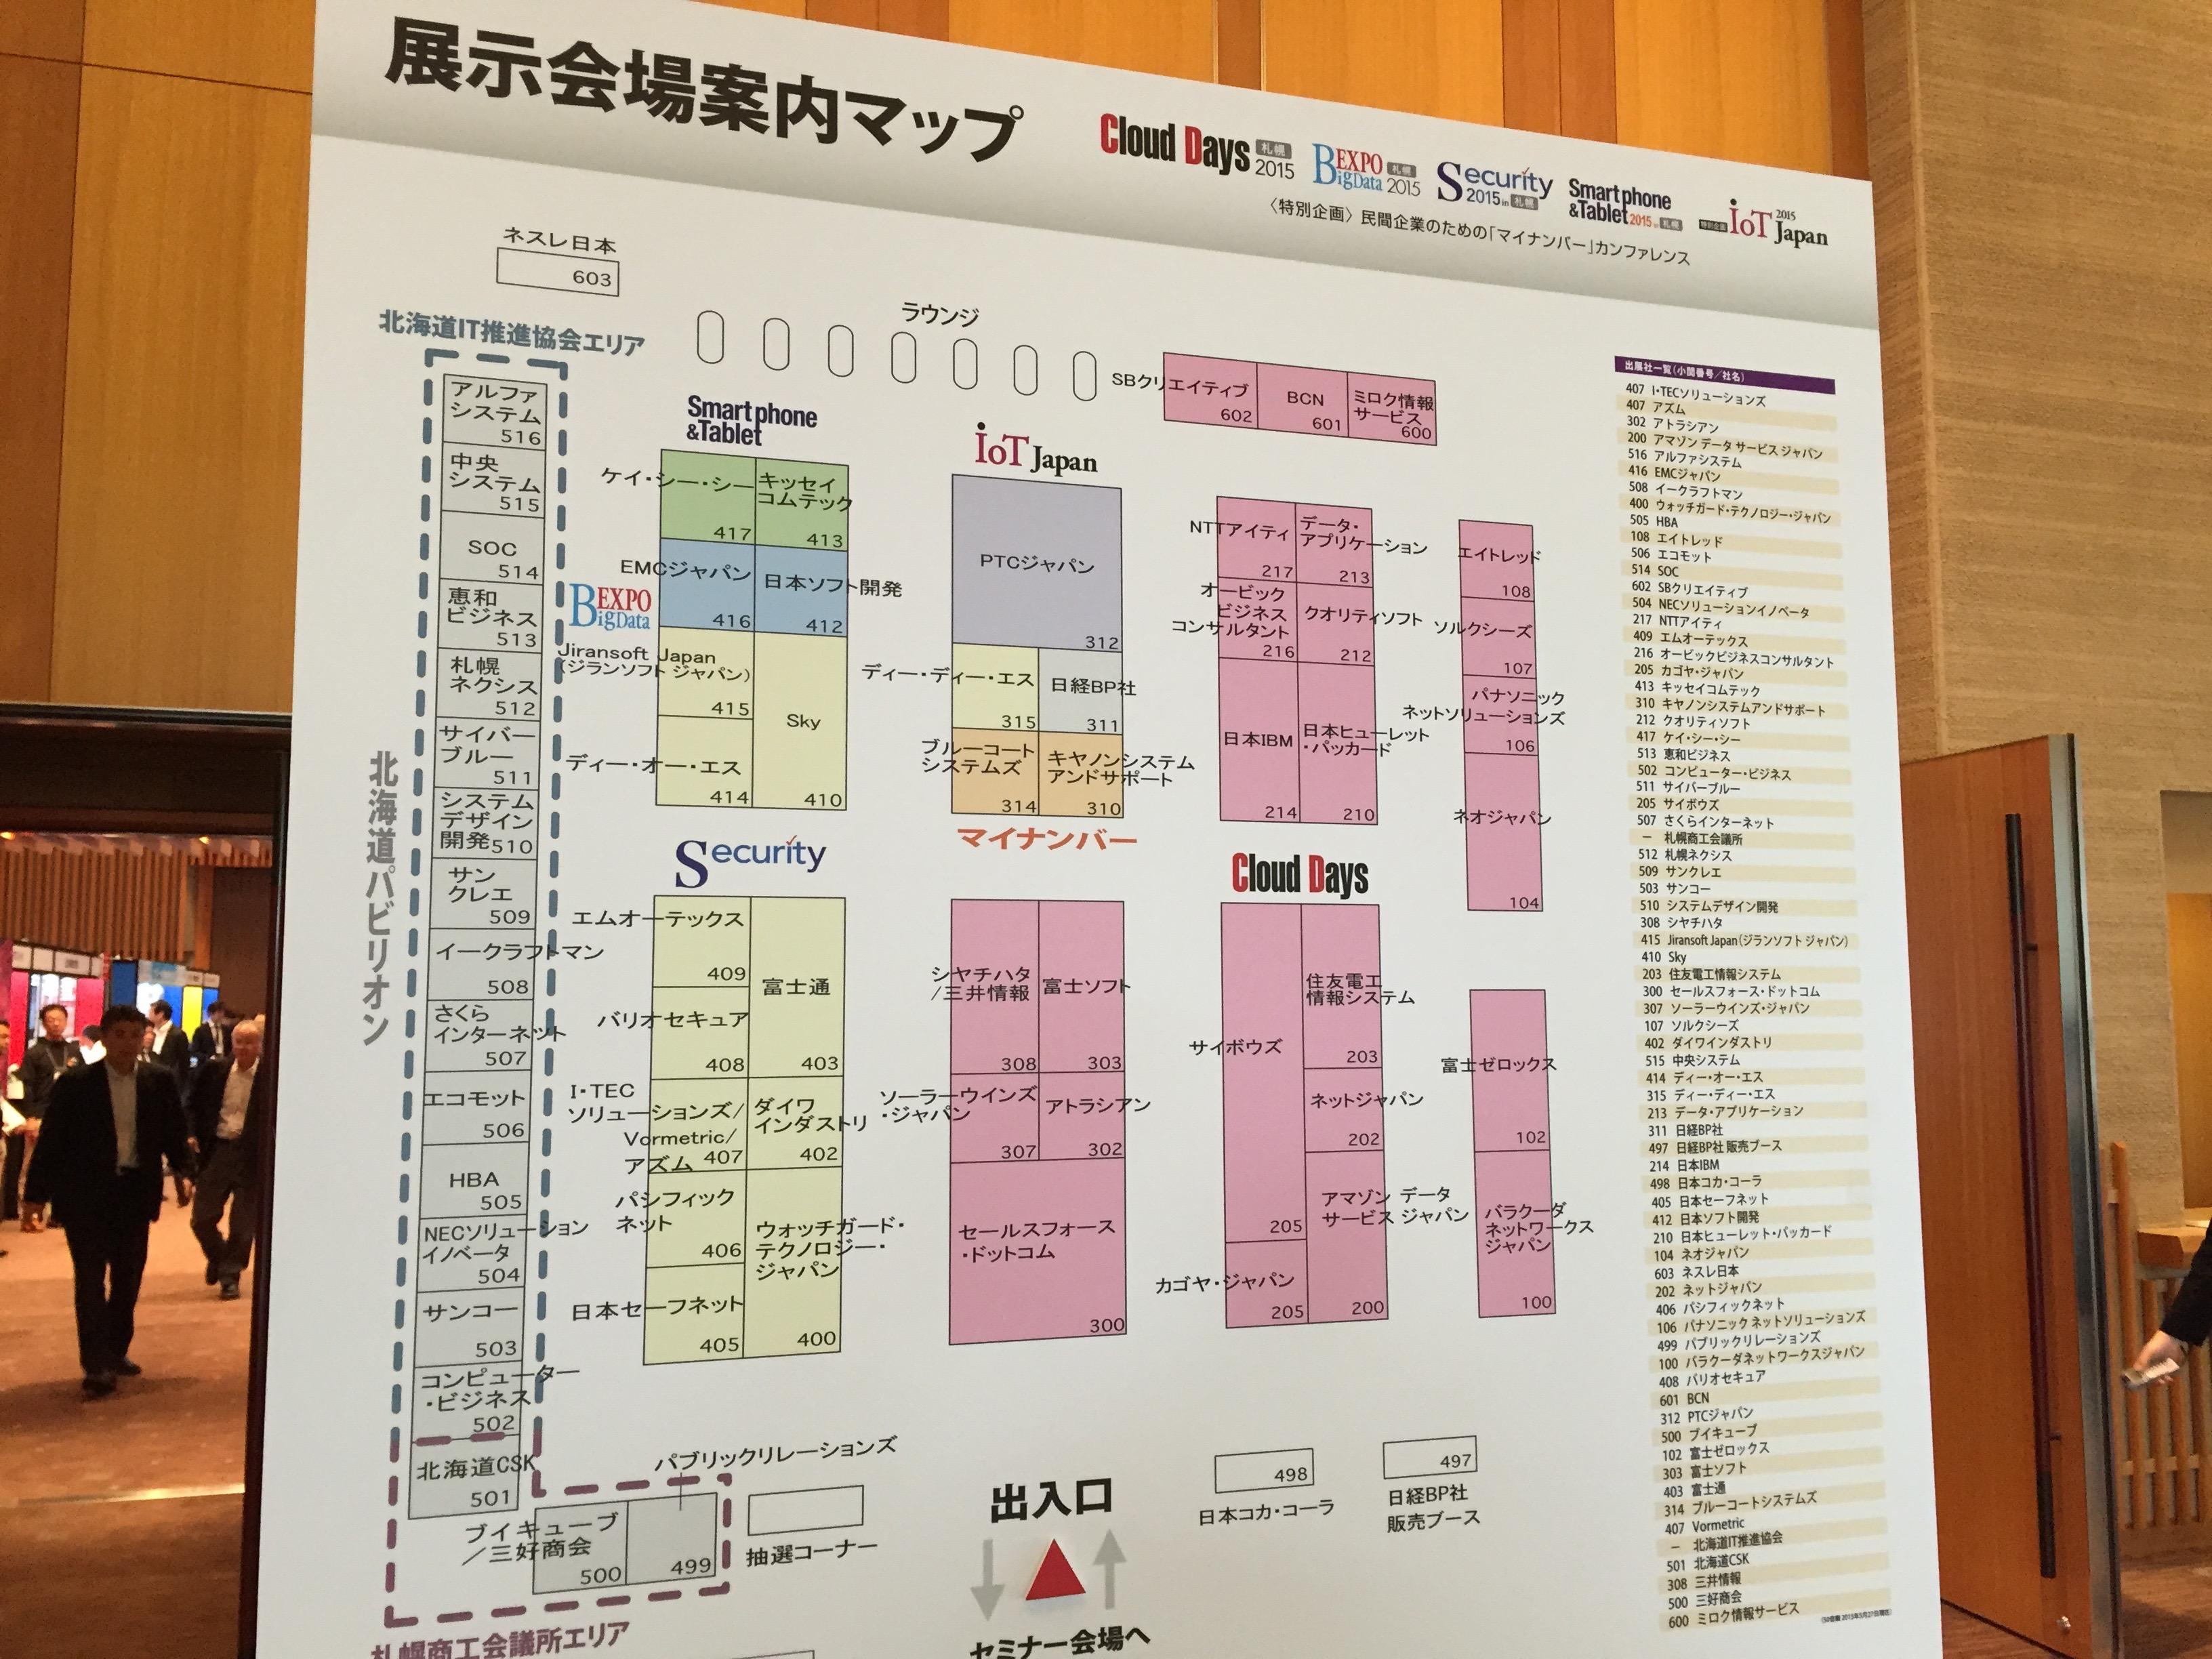 Cloud Days 札幌 2015に行ってみた@札幌コンベンションセンター